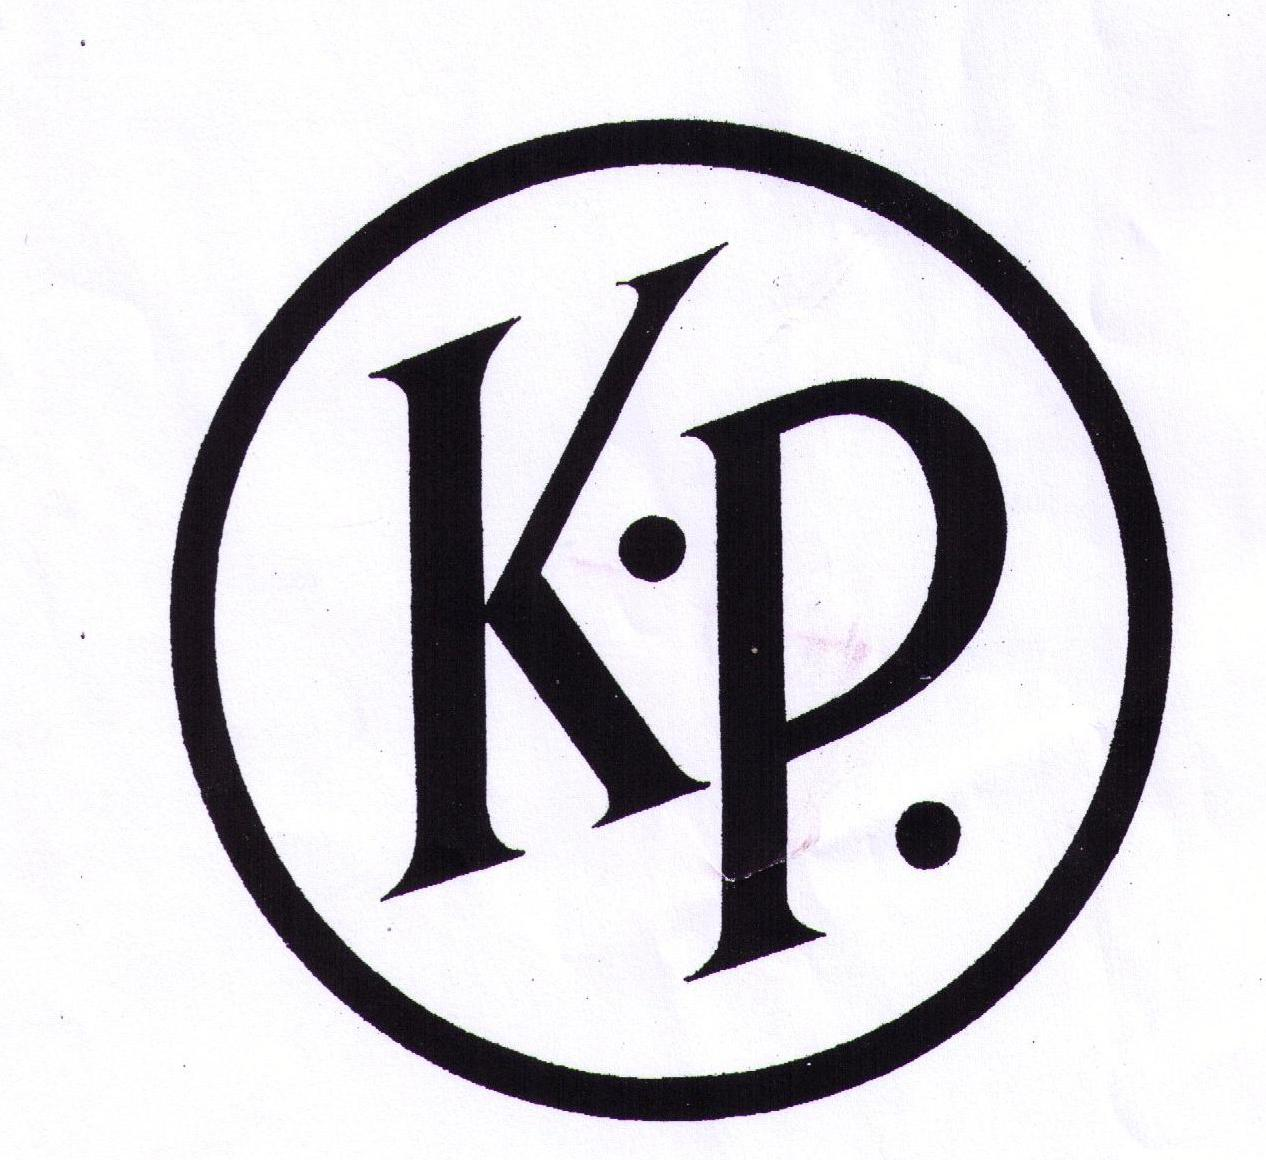 File:KP LOGO 1950s.jpg - Wikimedia Commons